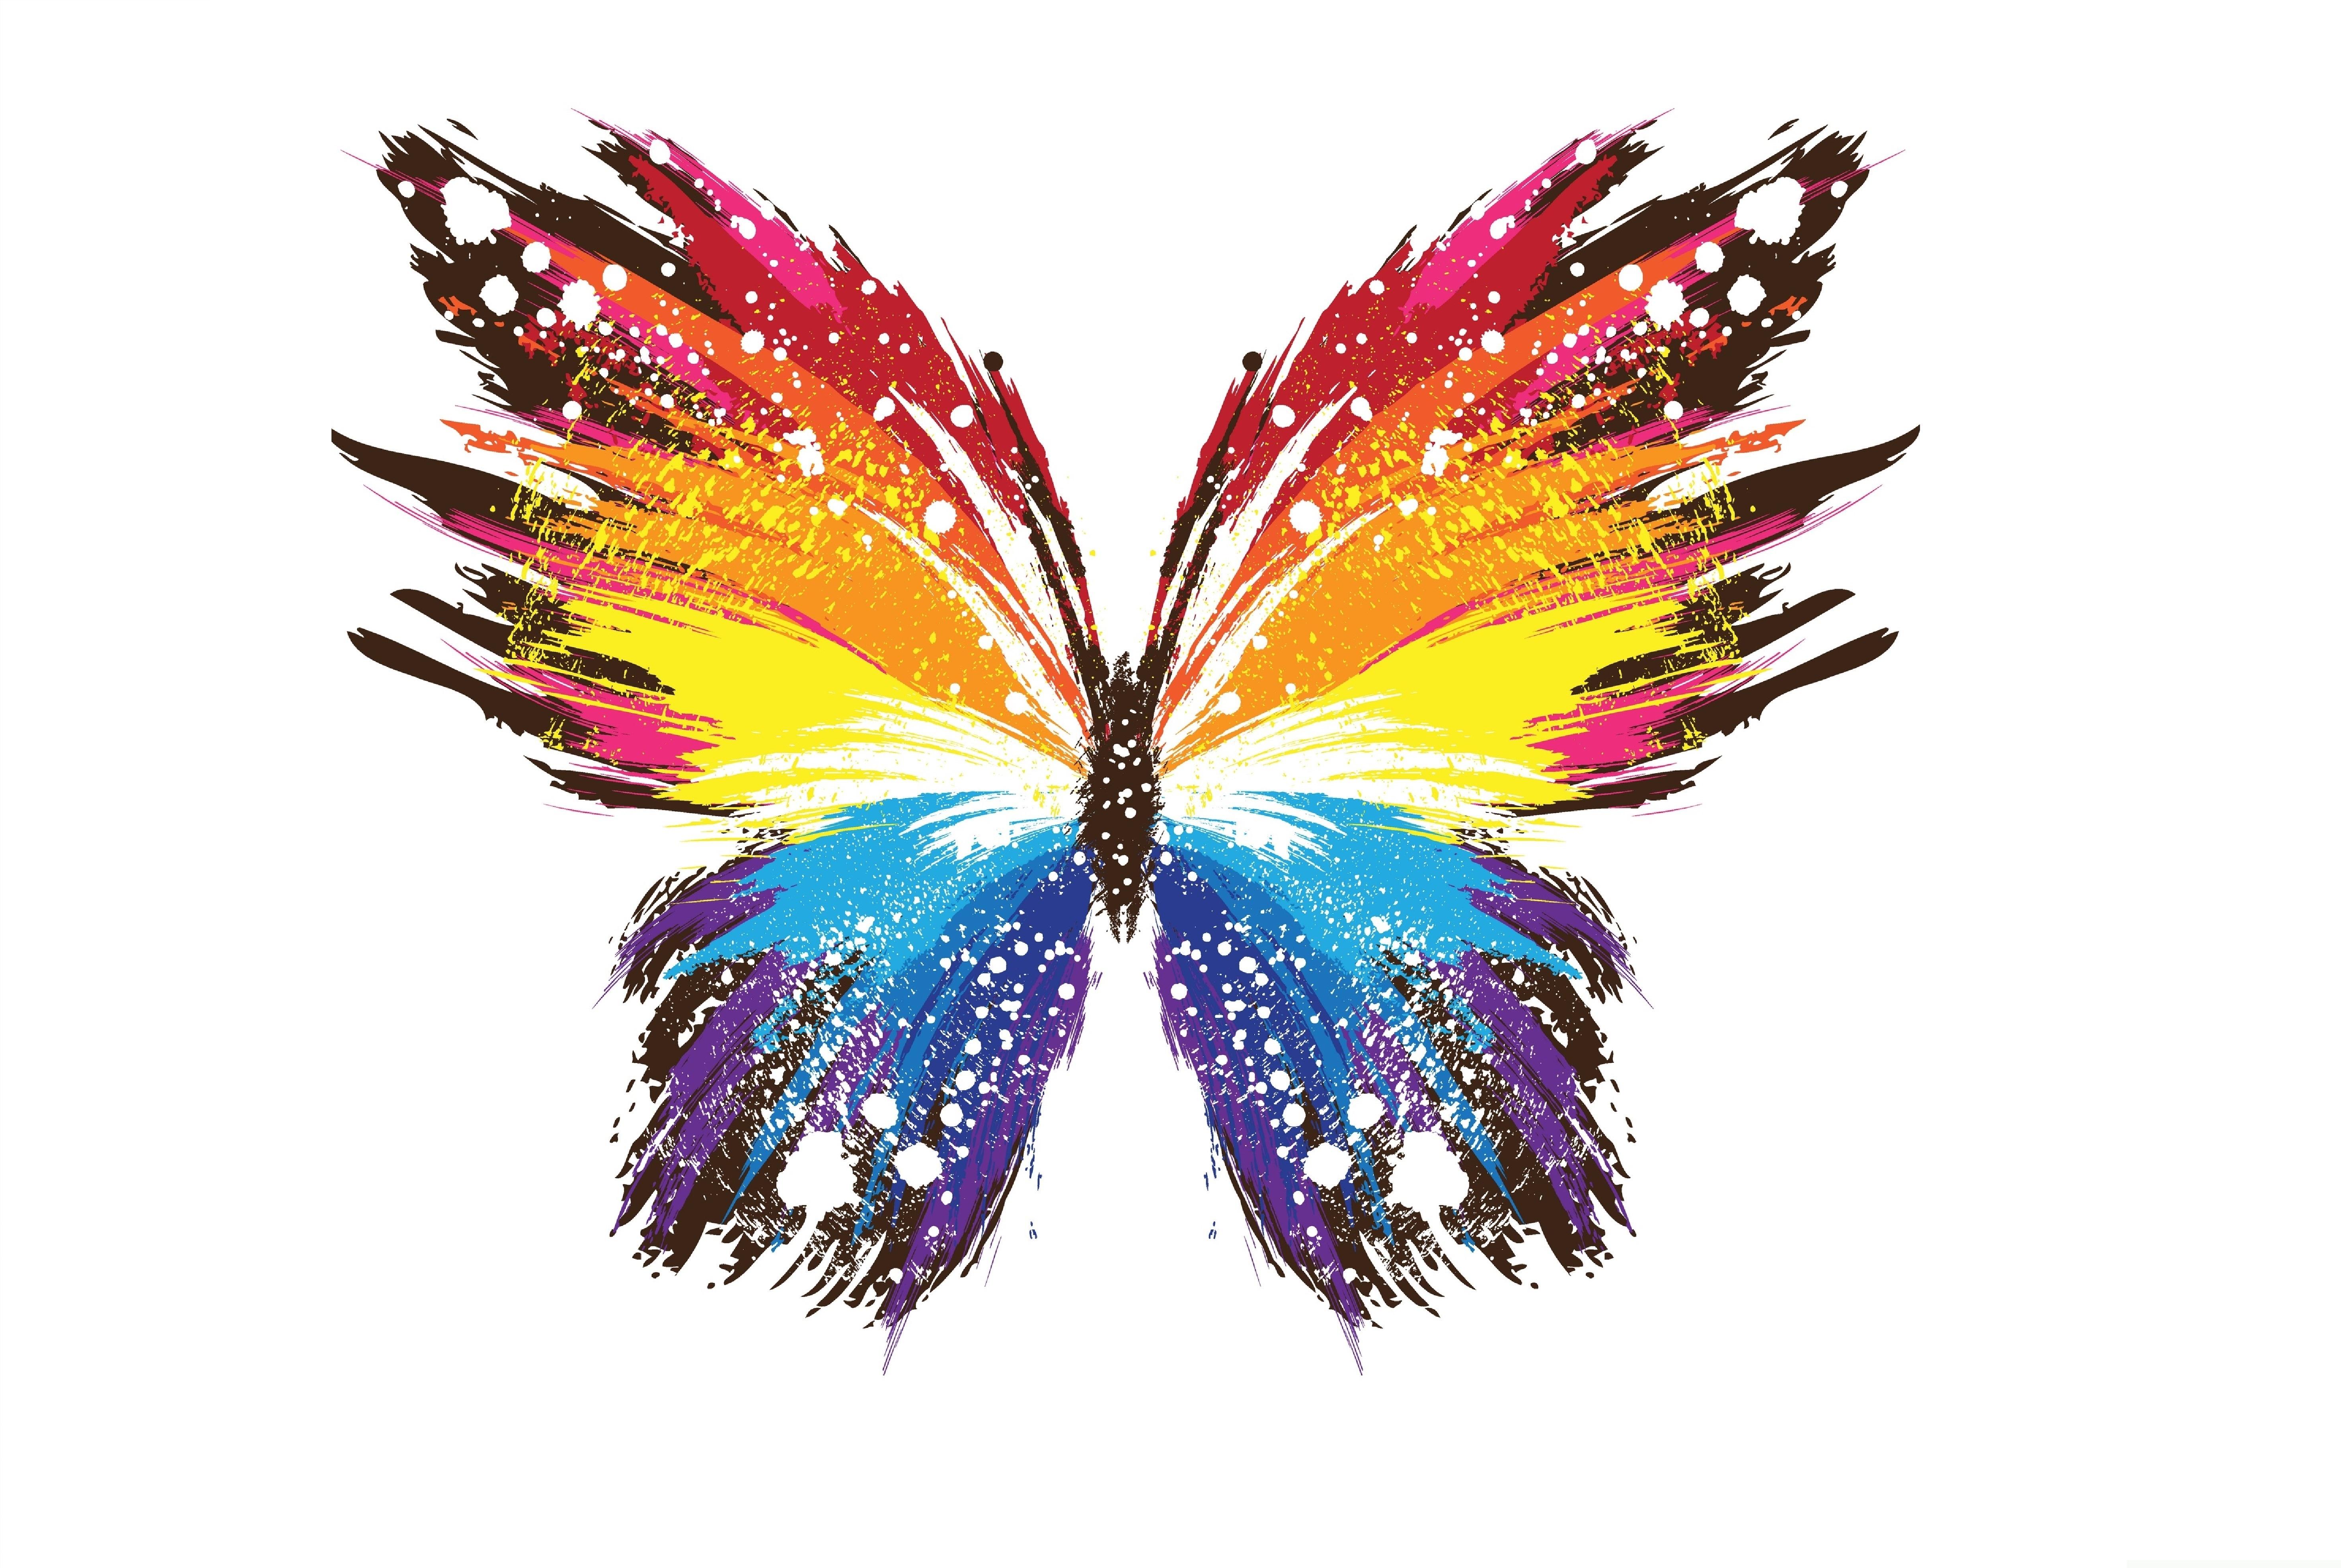 5883x3941 Wallpaper Butterflies Animals Vector Graphics 5883x3941